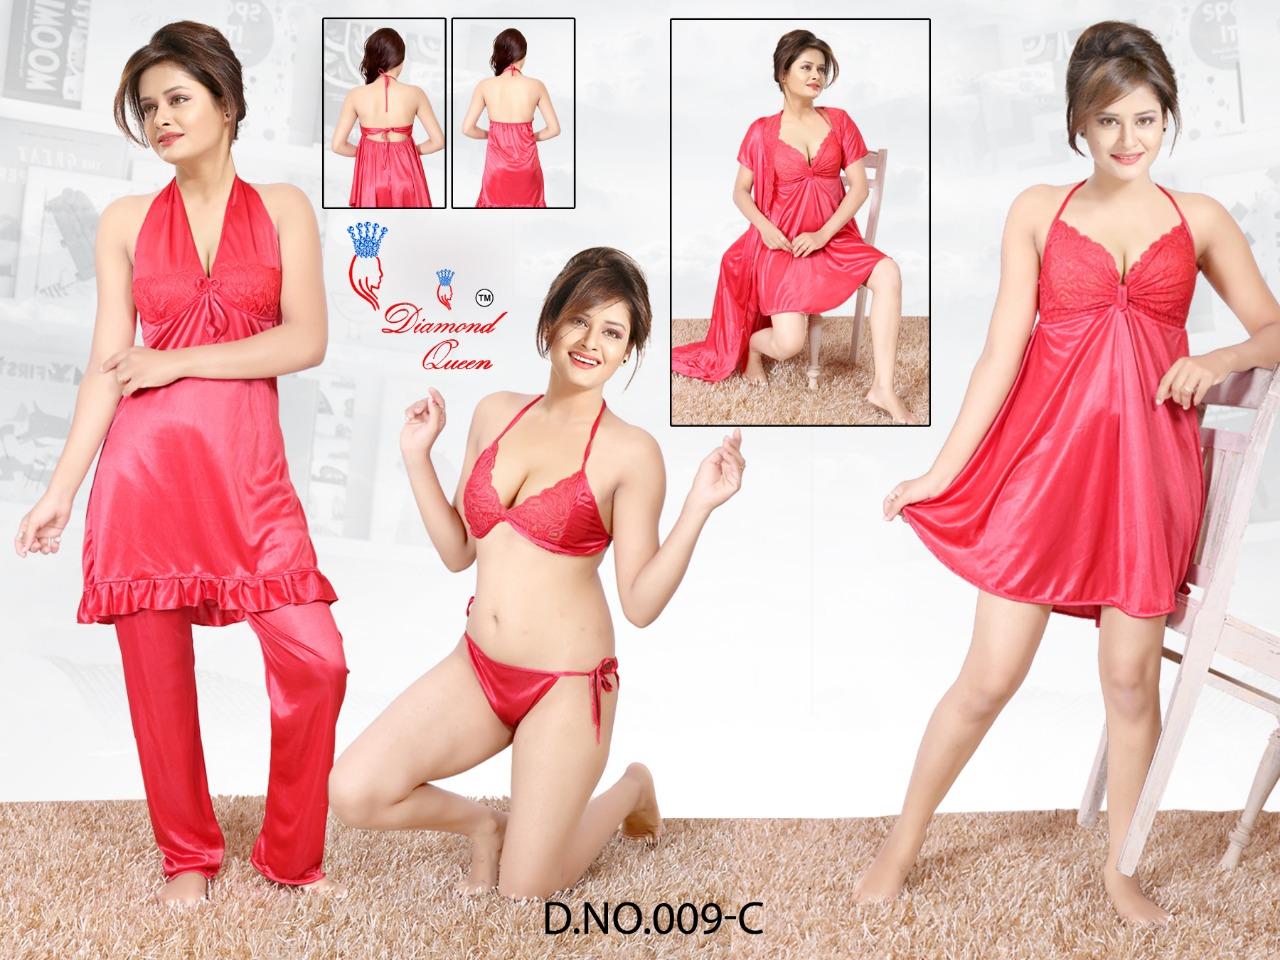 Diamond Queen Design No 009 Satin Night Gowns Catalog Lowest Price